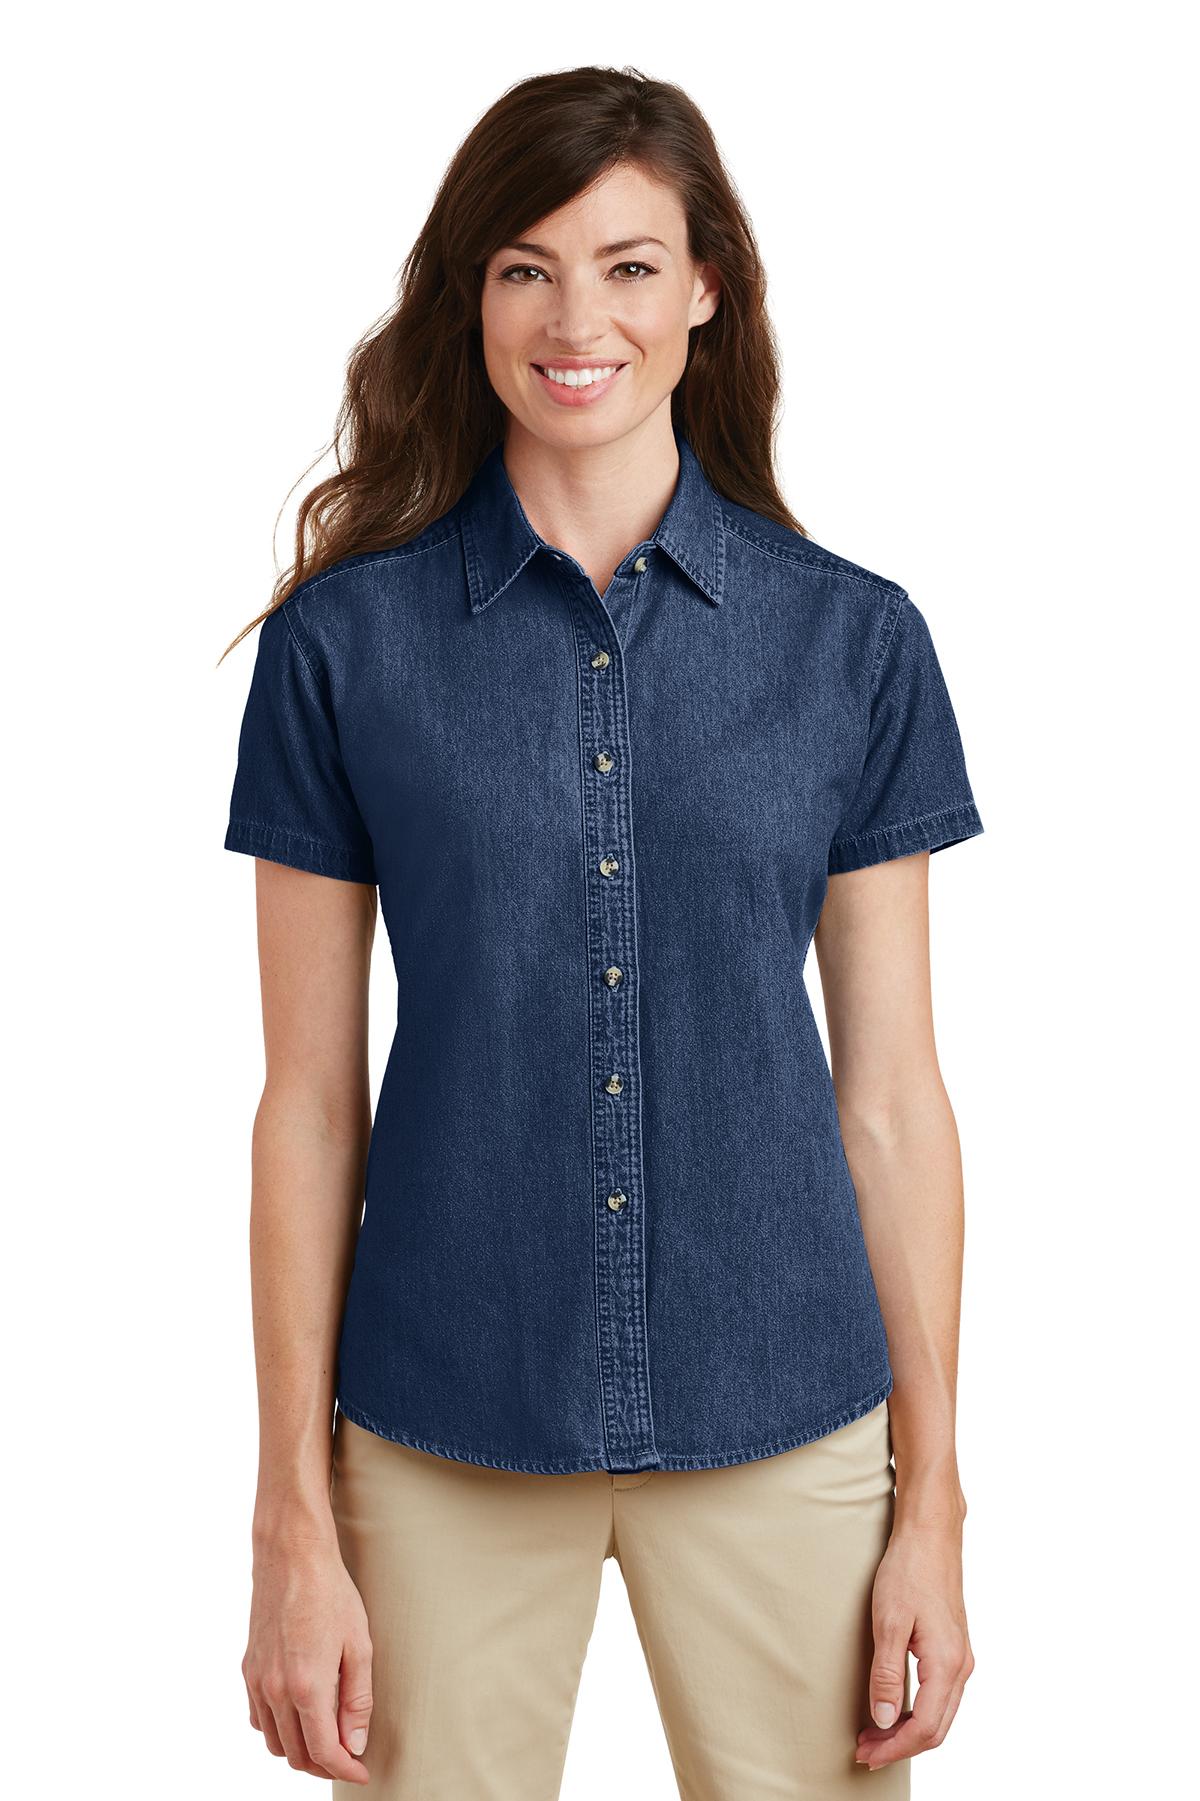 84040275417 Port   Company® - Ladies Short Sleeve Value Denim Shirt